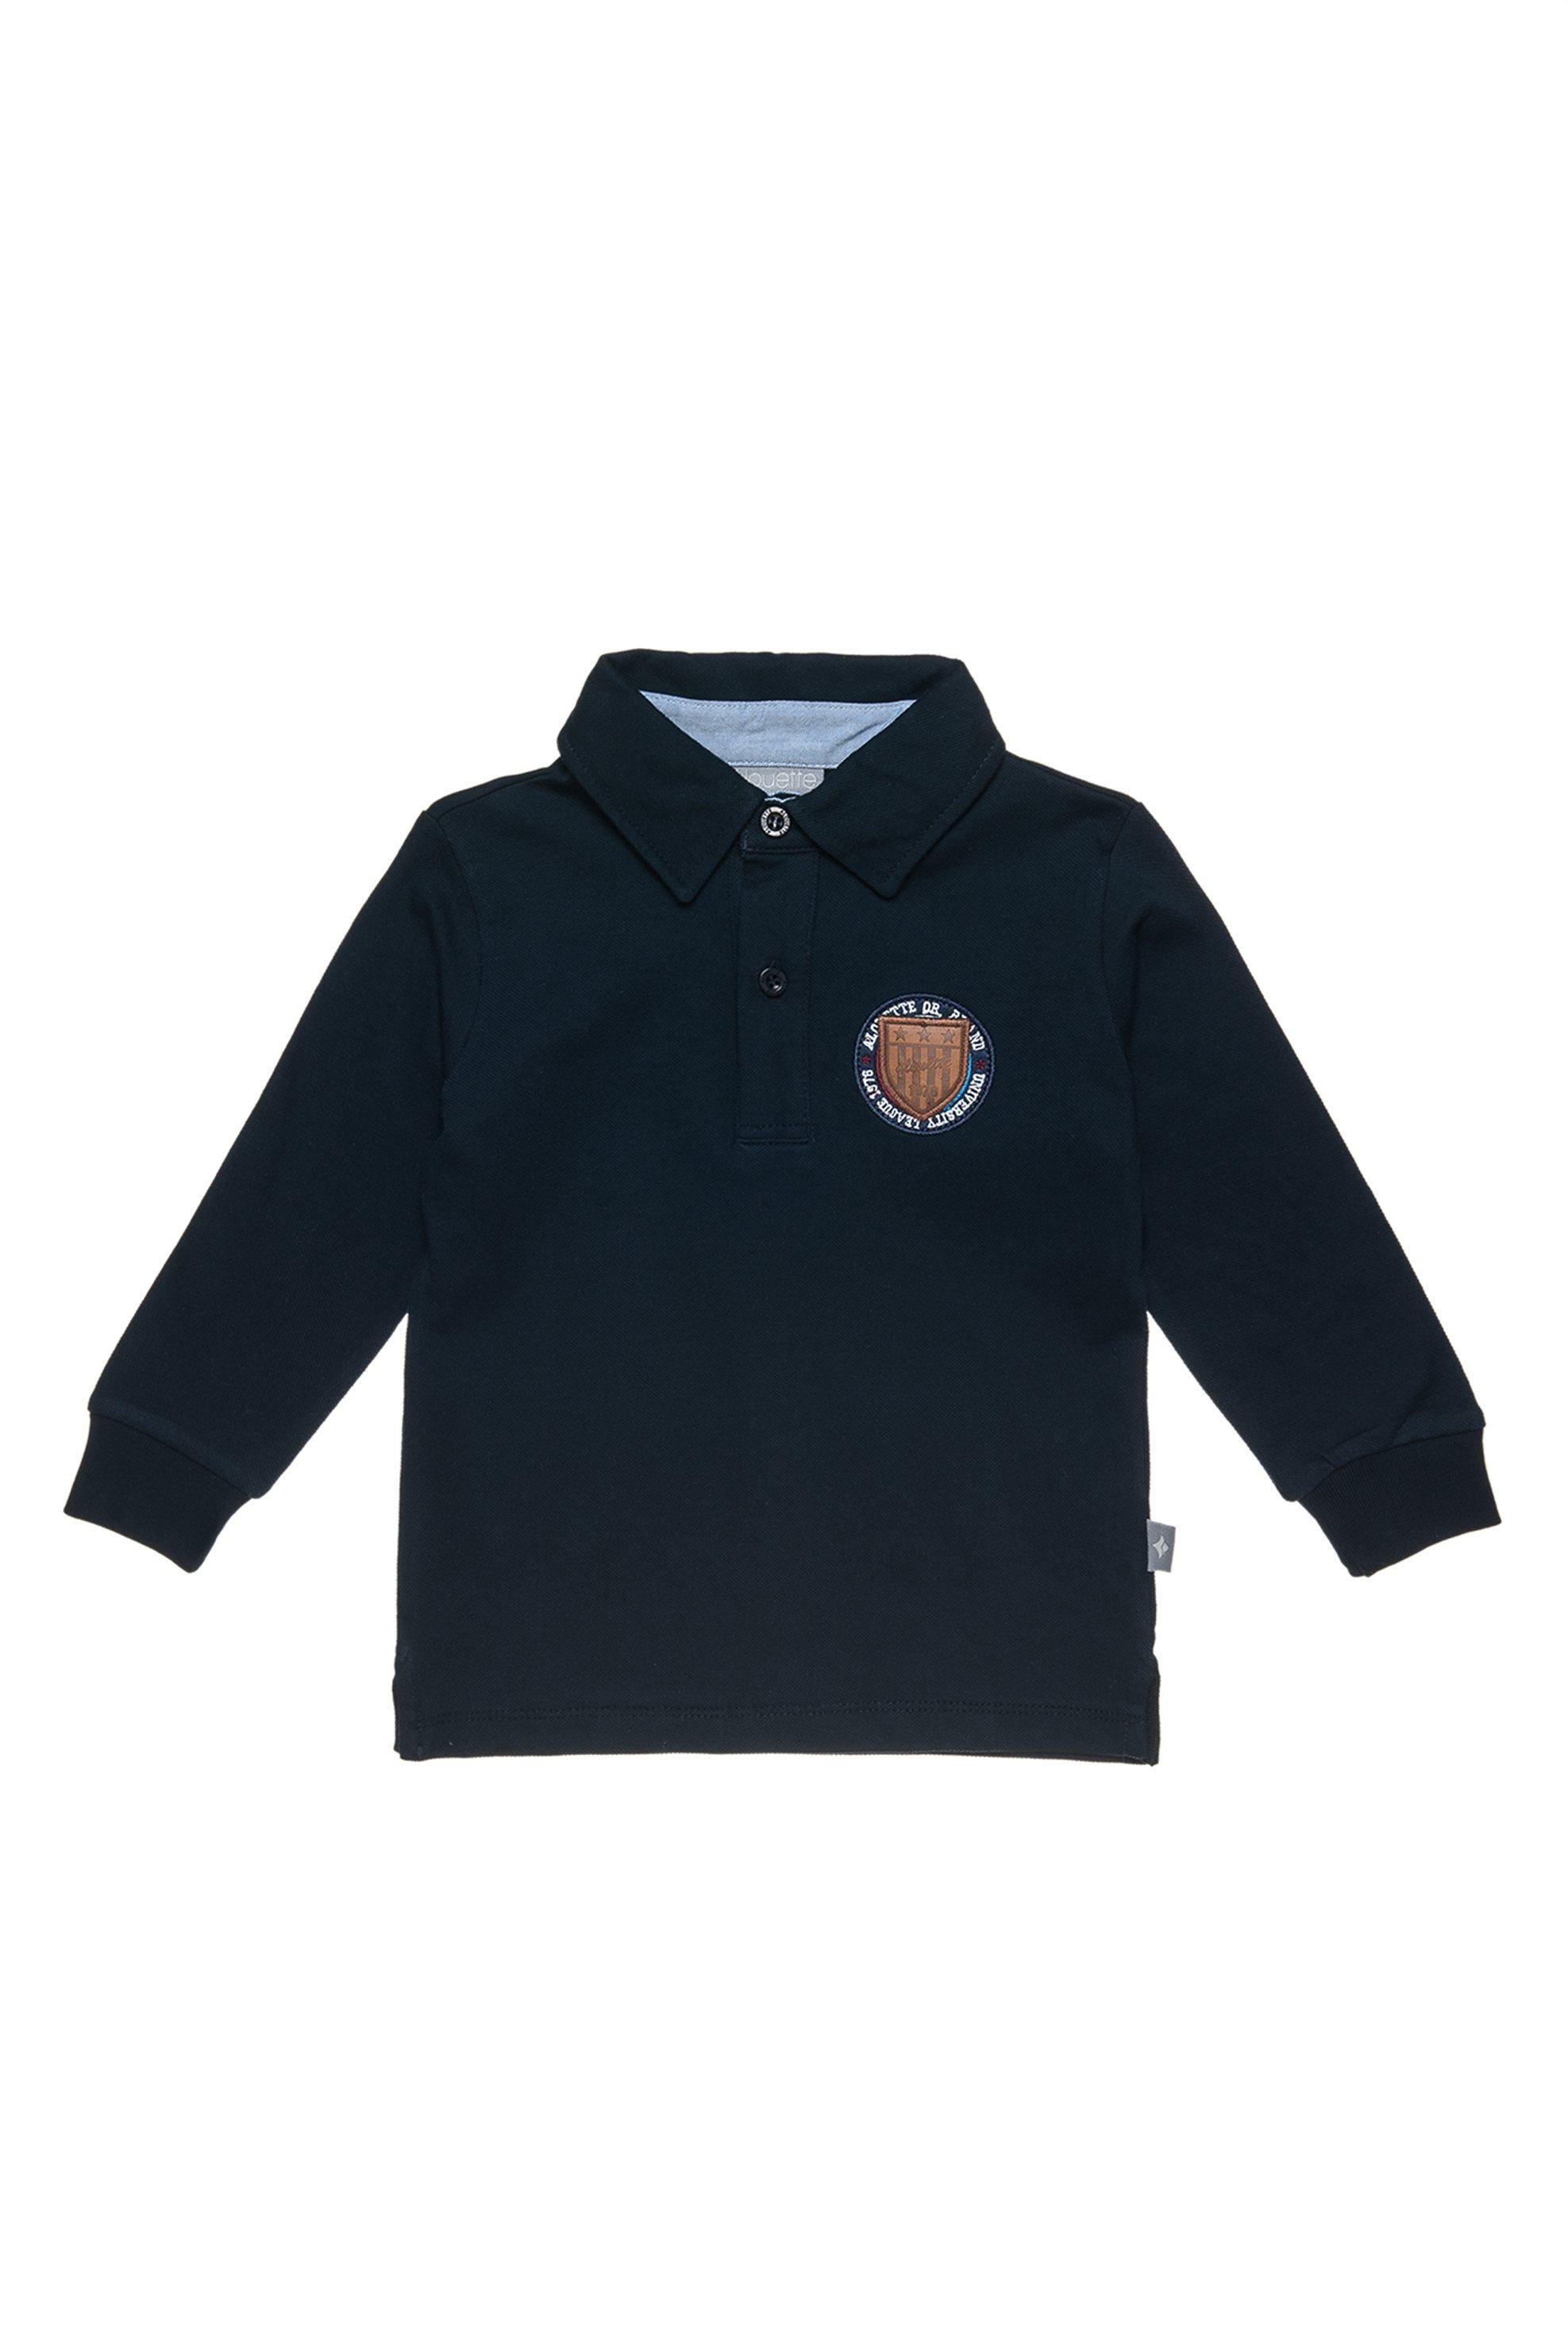 Notos Alouette παιδική μπλούζα polo με patch - 00221295 - Μπλε Σκούρο 7e5472c3d82